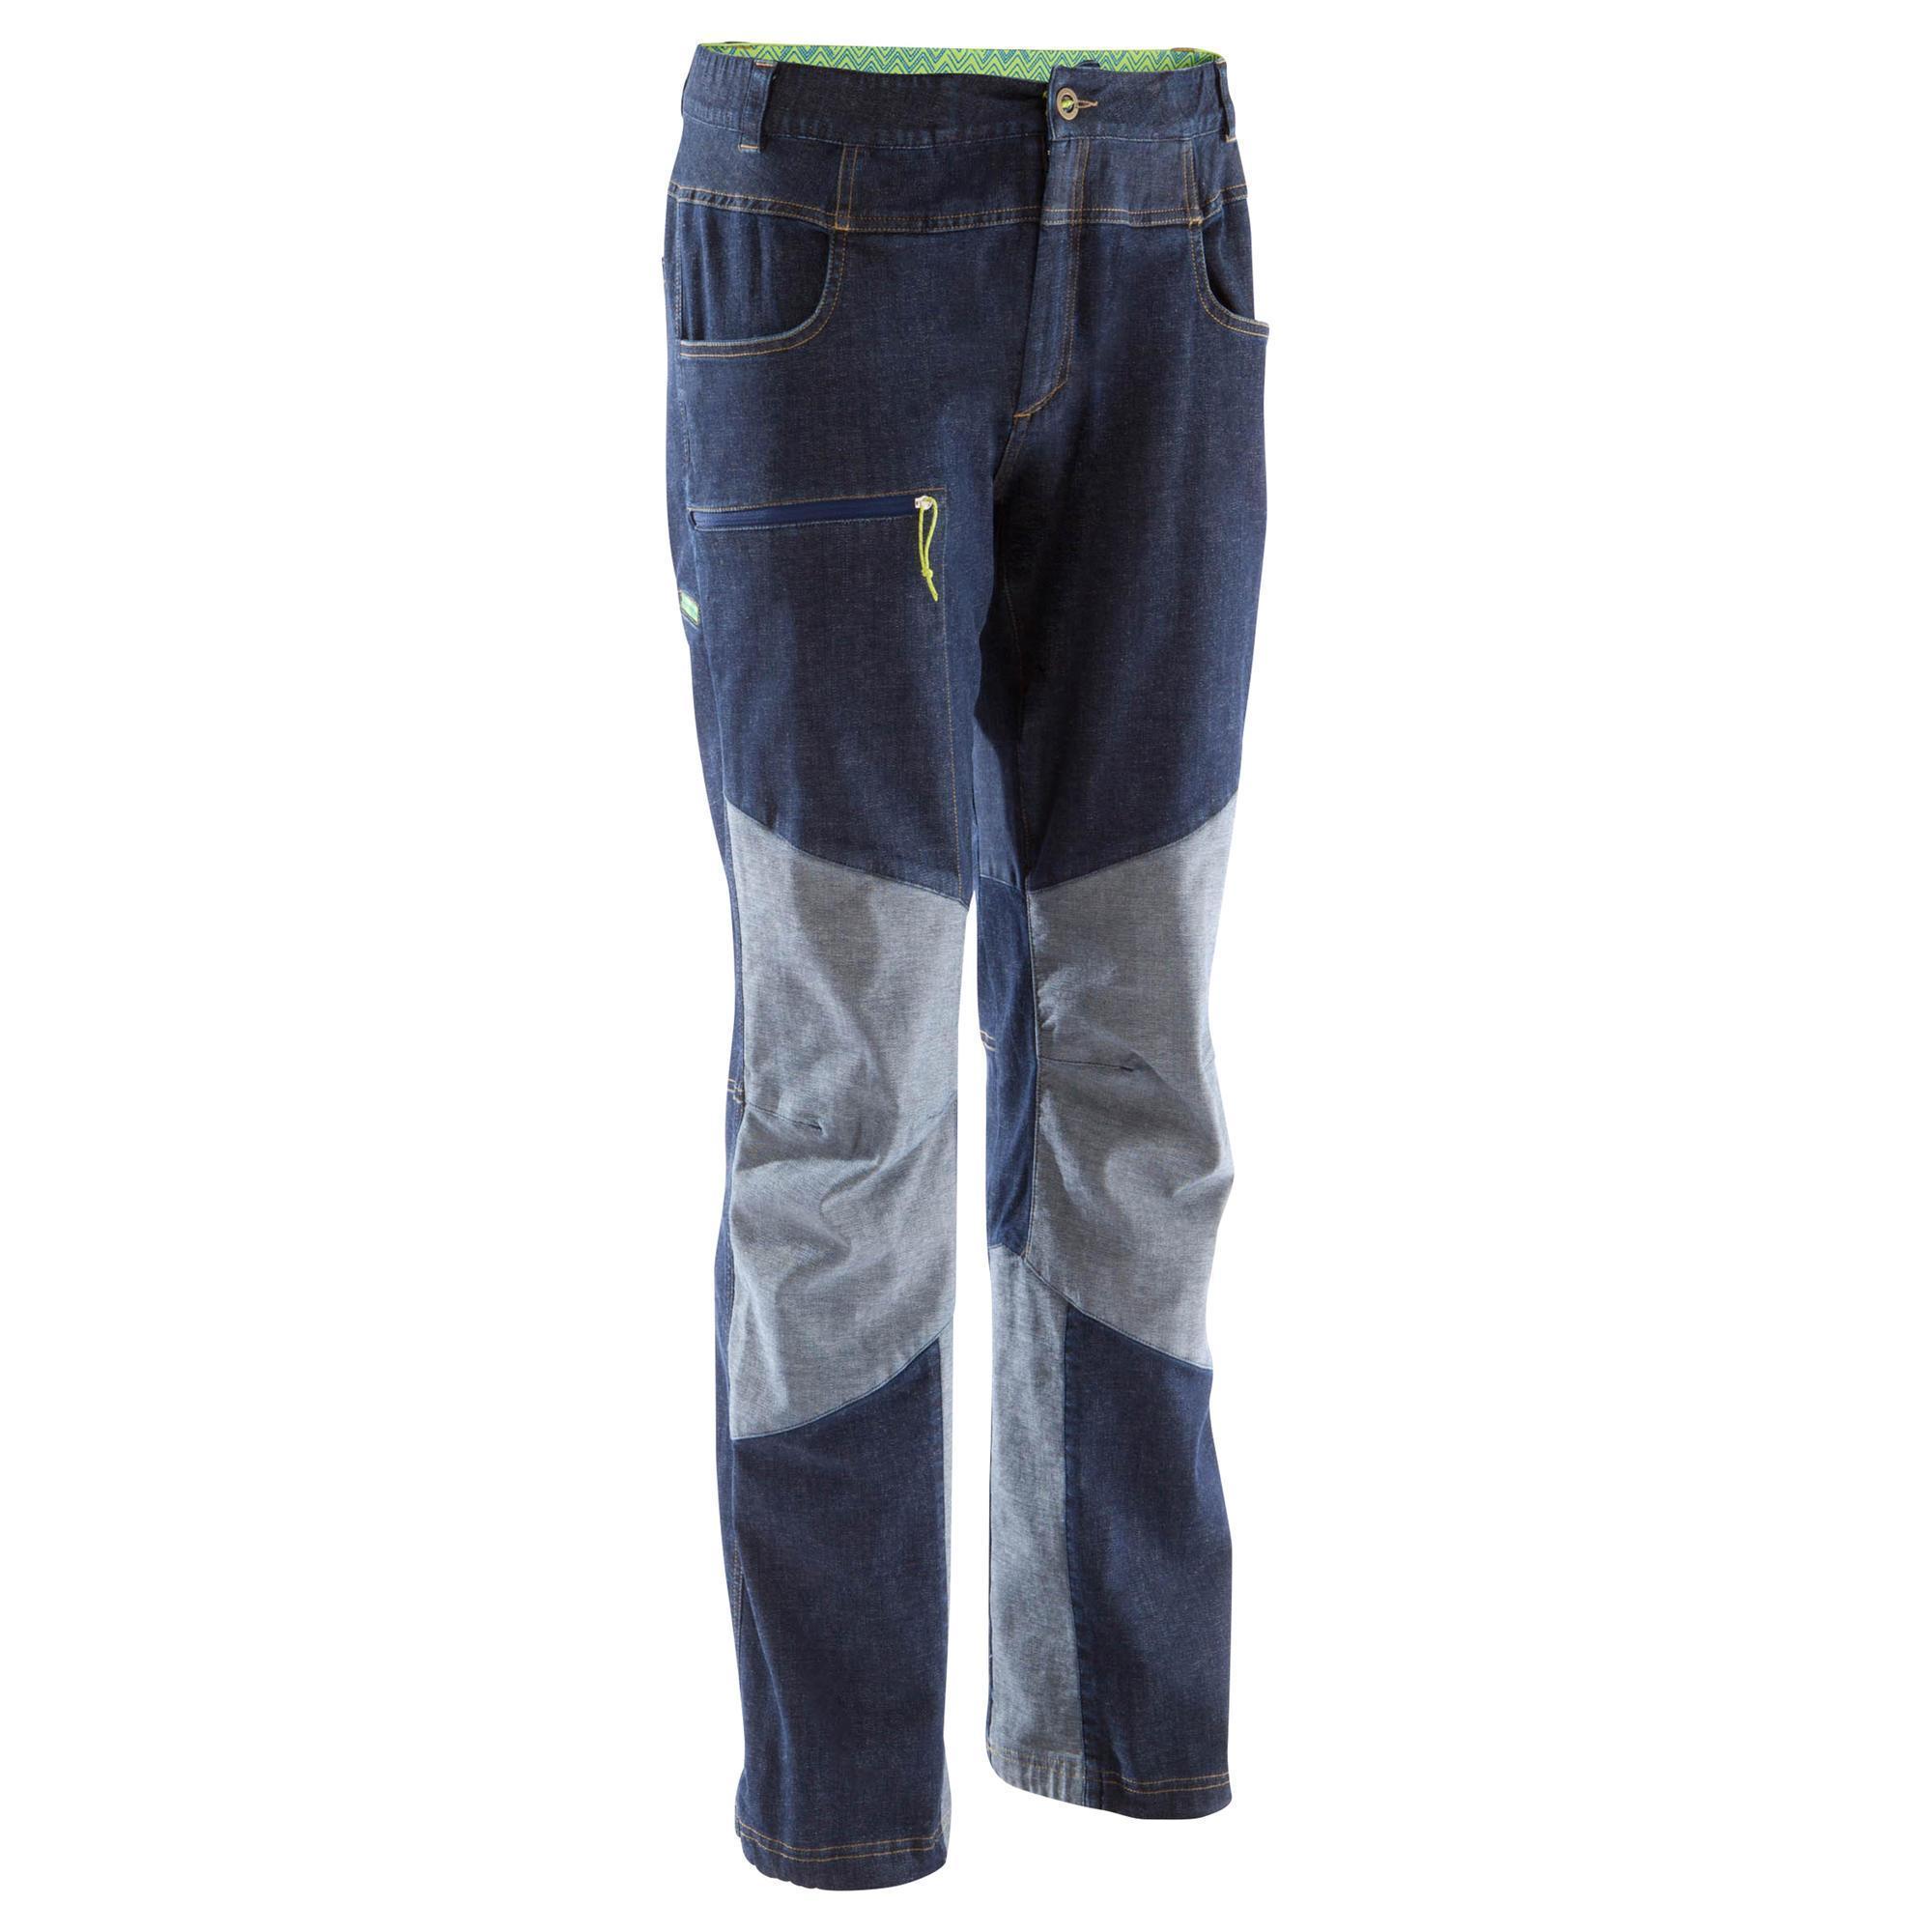 pantalon jean rock homme bleu simond. Black Bedroom Furniture Sets. Home Design Ideas